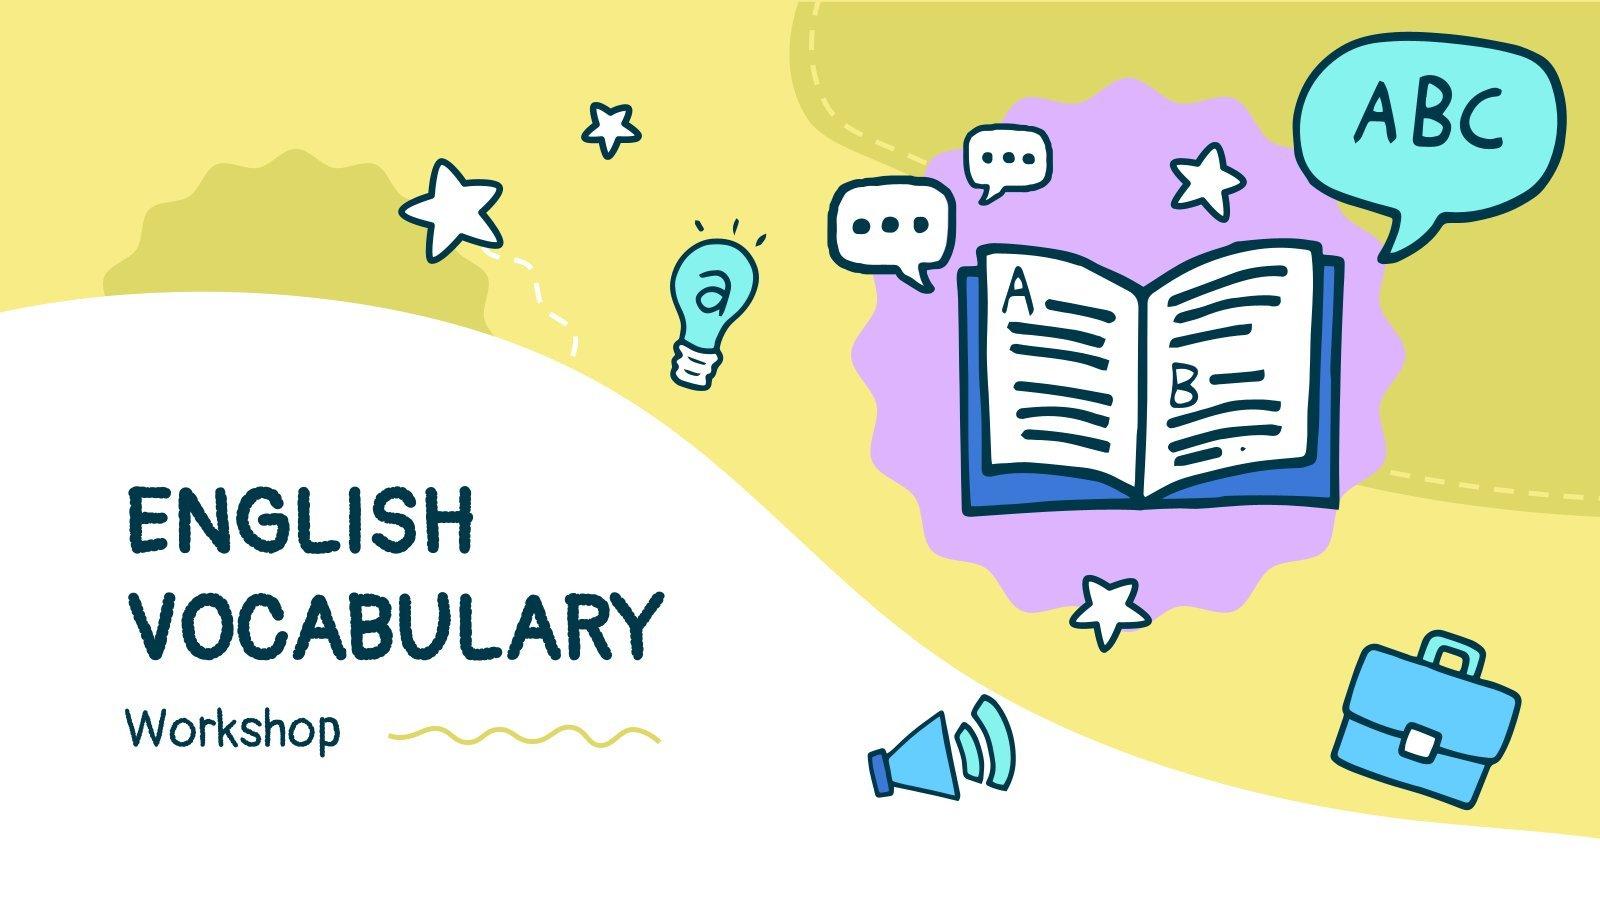 English Vocabulary Workshop presentation template